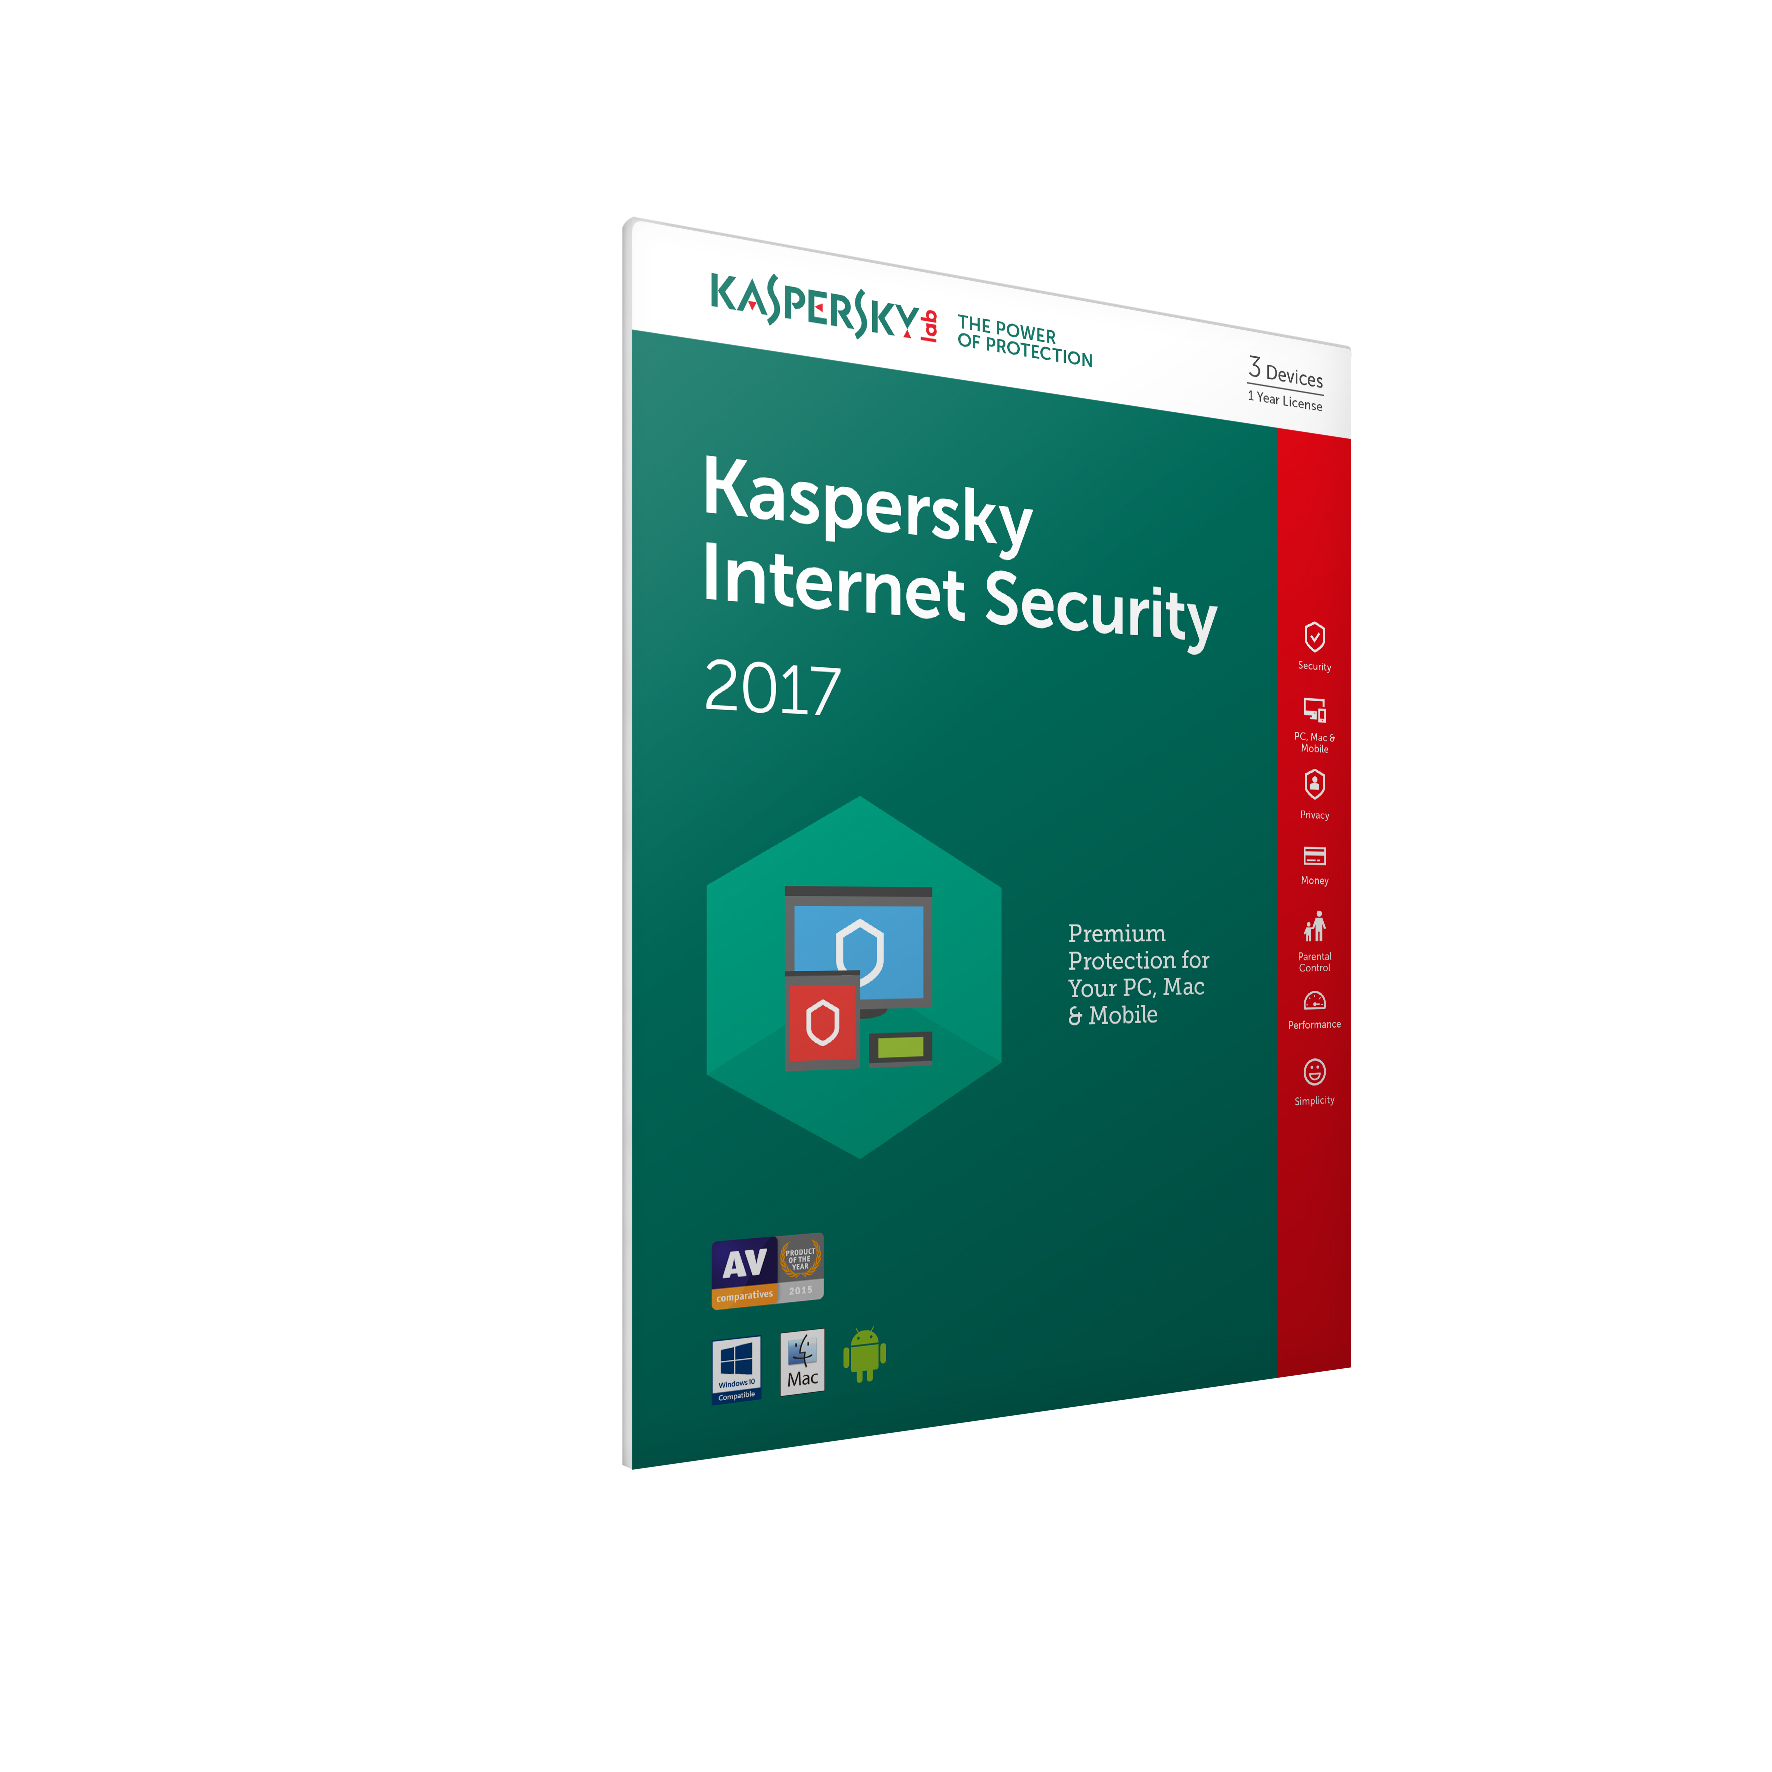 Kaspersky Lab Kaspersky Internet Security 2017 - 3 Devices 1 Year (Frustration Free Packaging)